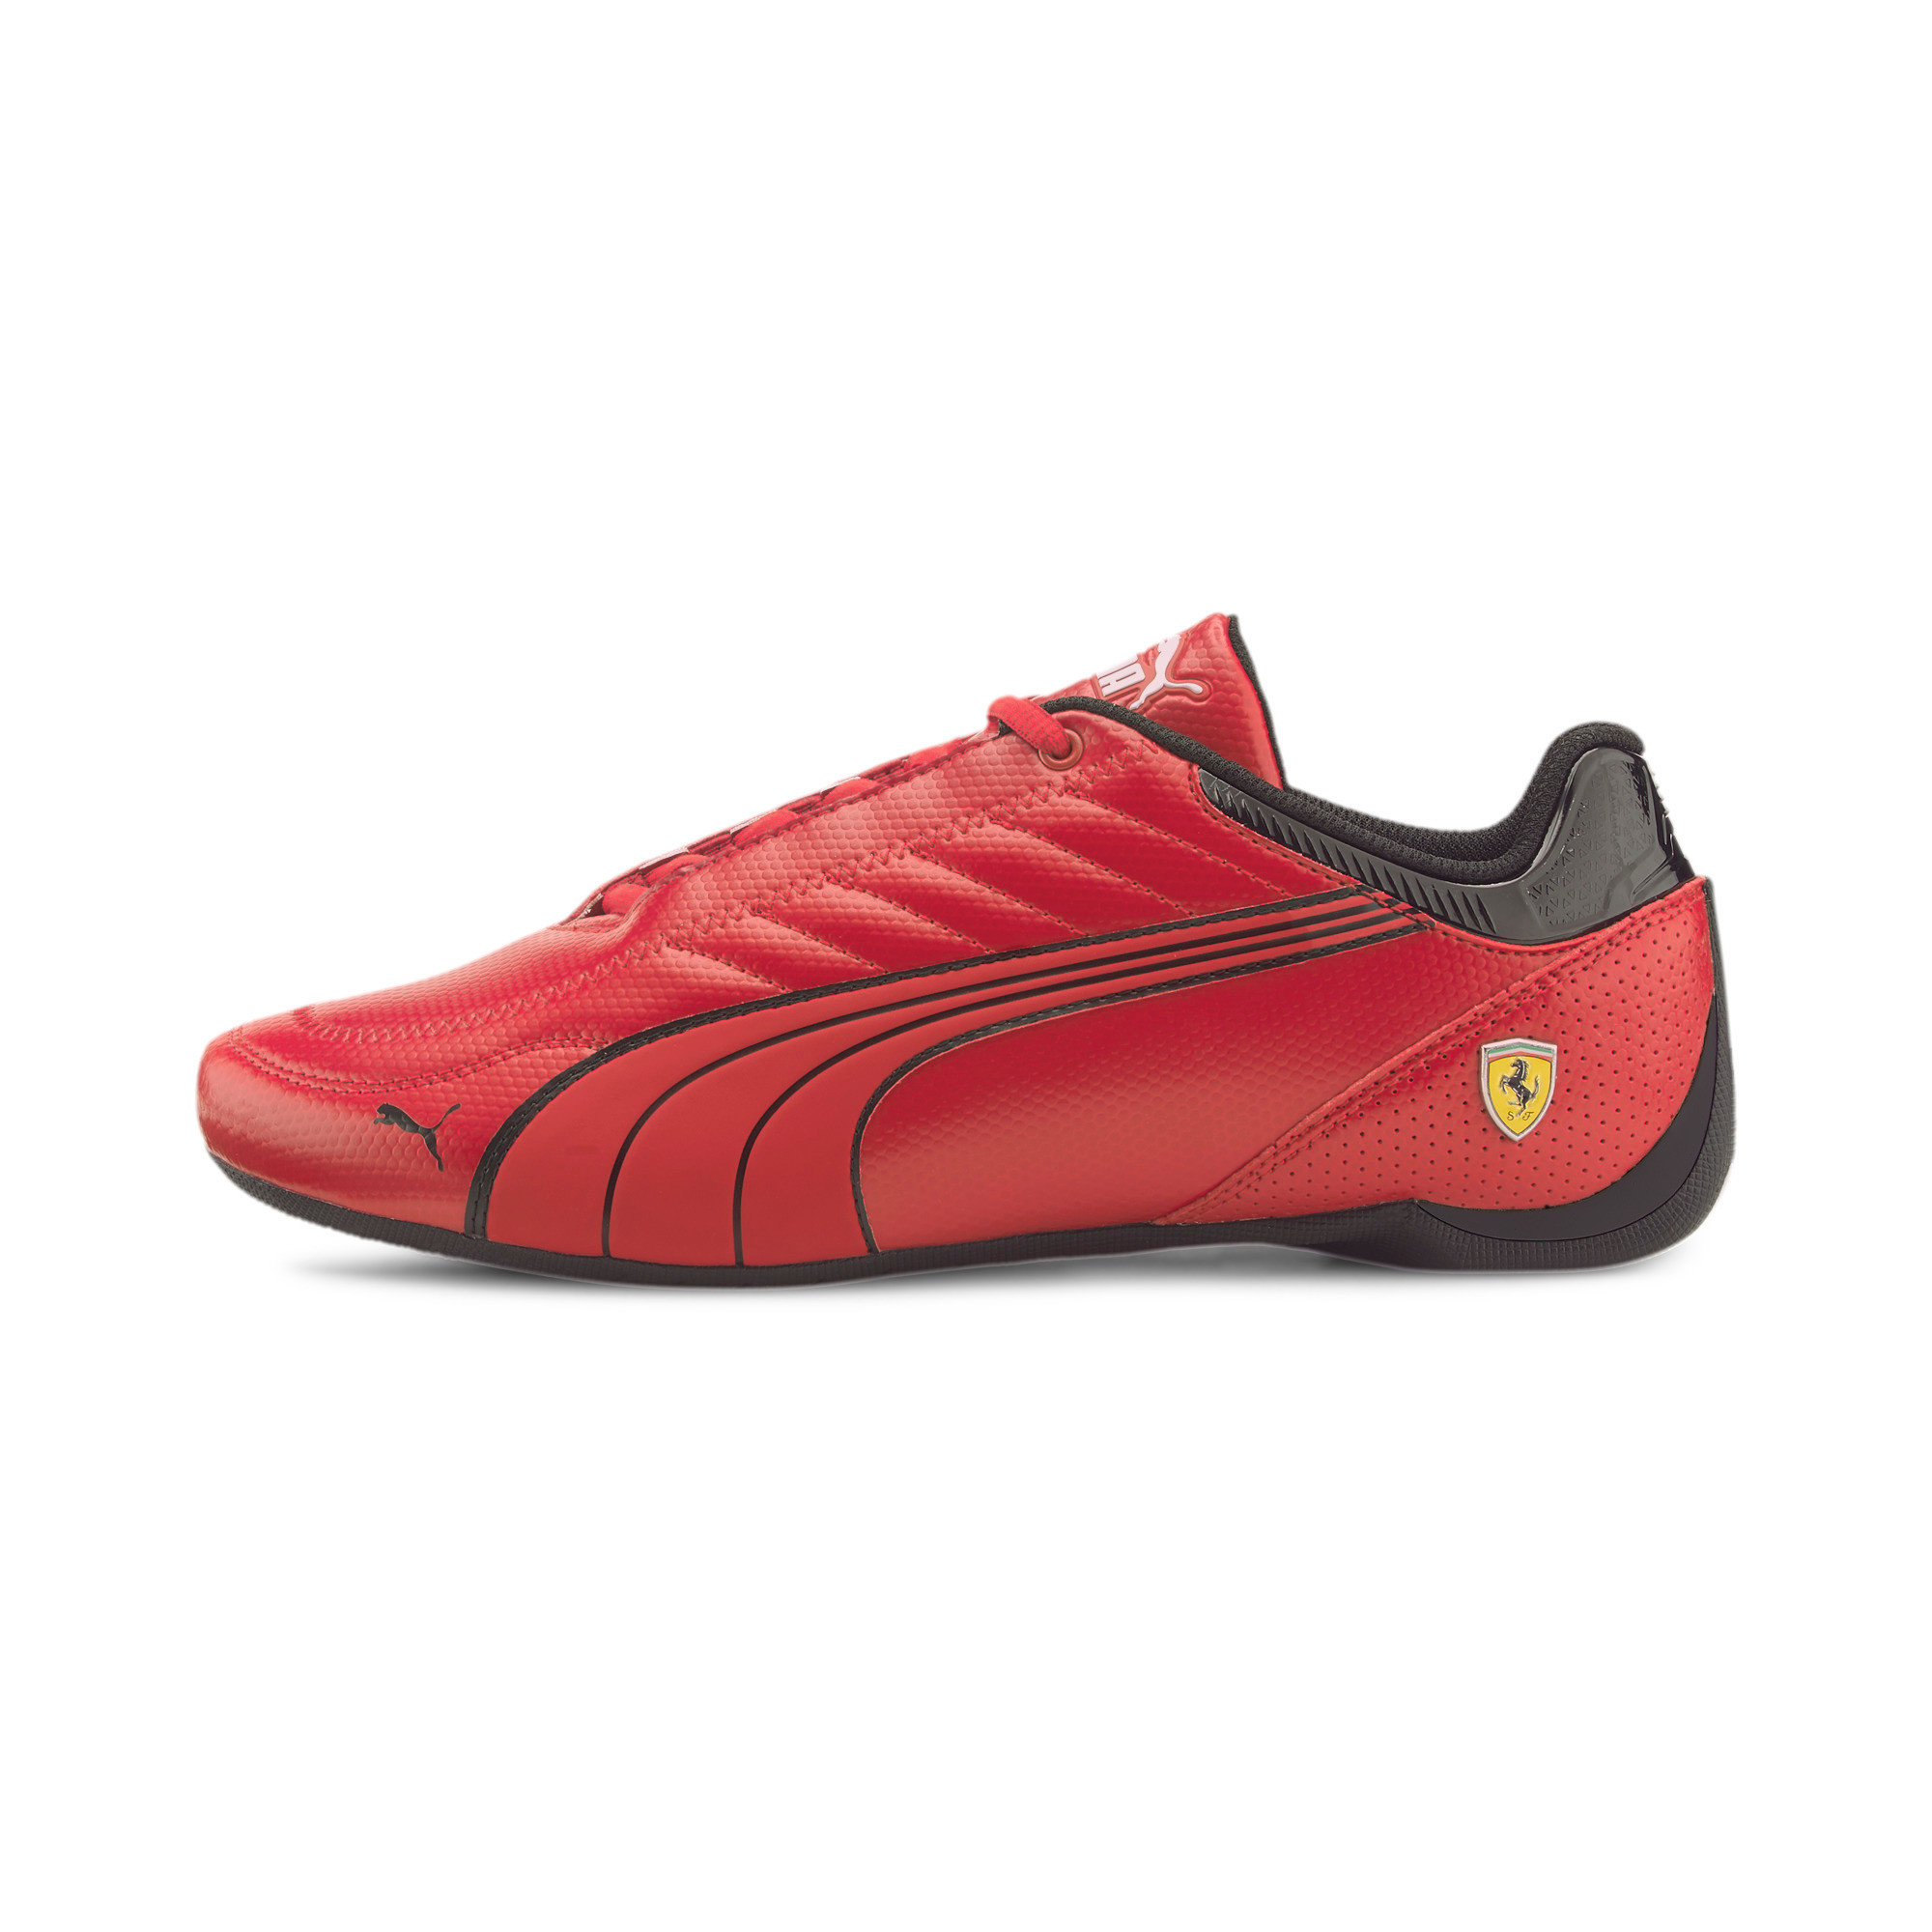 thumbnail 8 - Puma Men's Scuderia Ferrari Race Future Kart Cat Motorsport Shoes